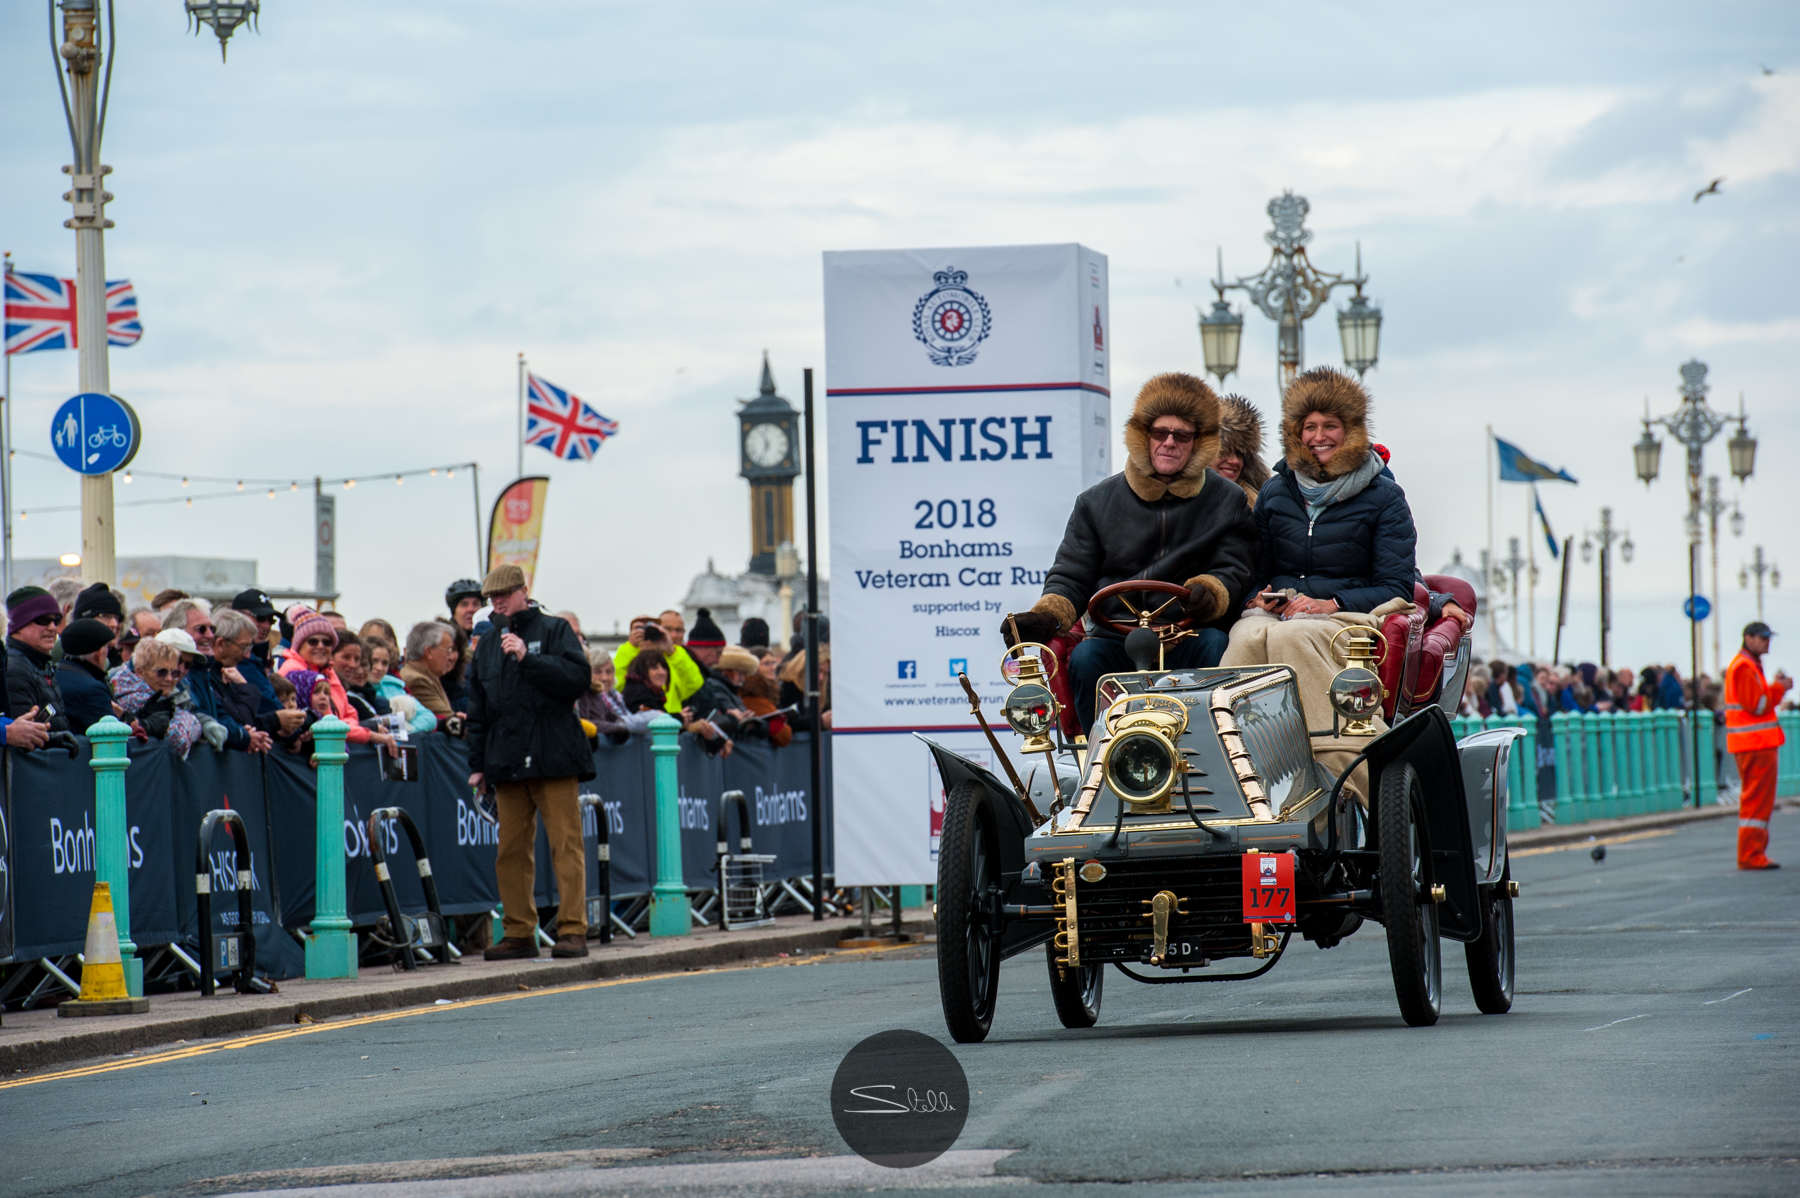 Bonhams London to Brighton Veteran Car Run 2018